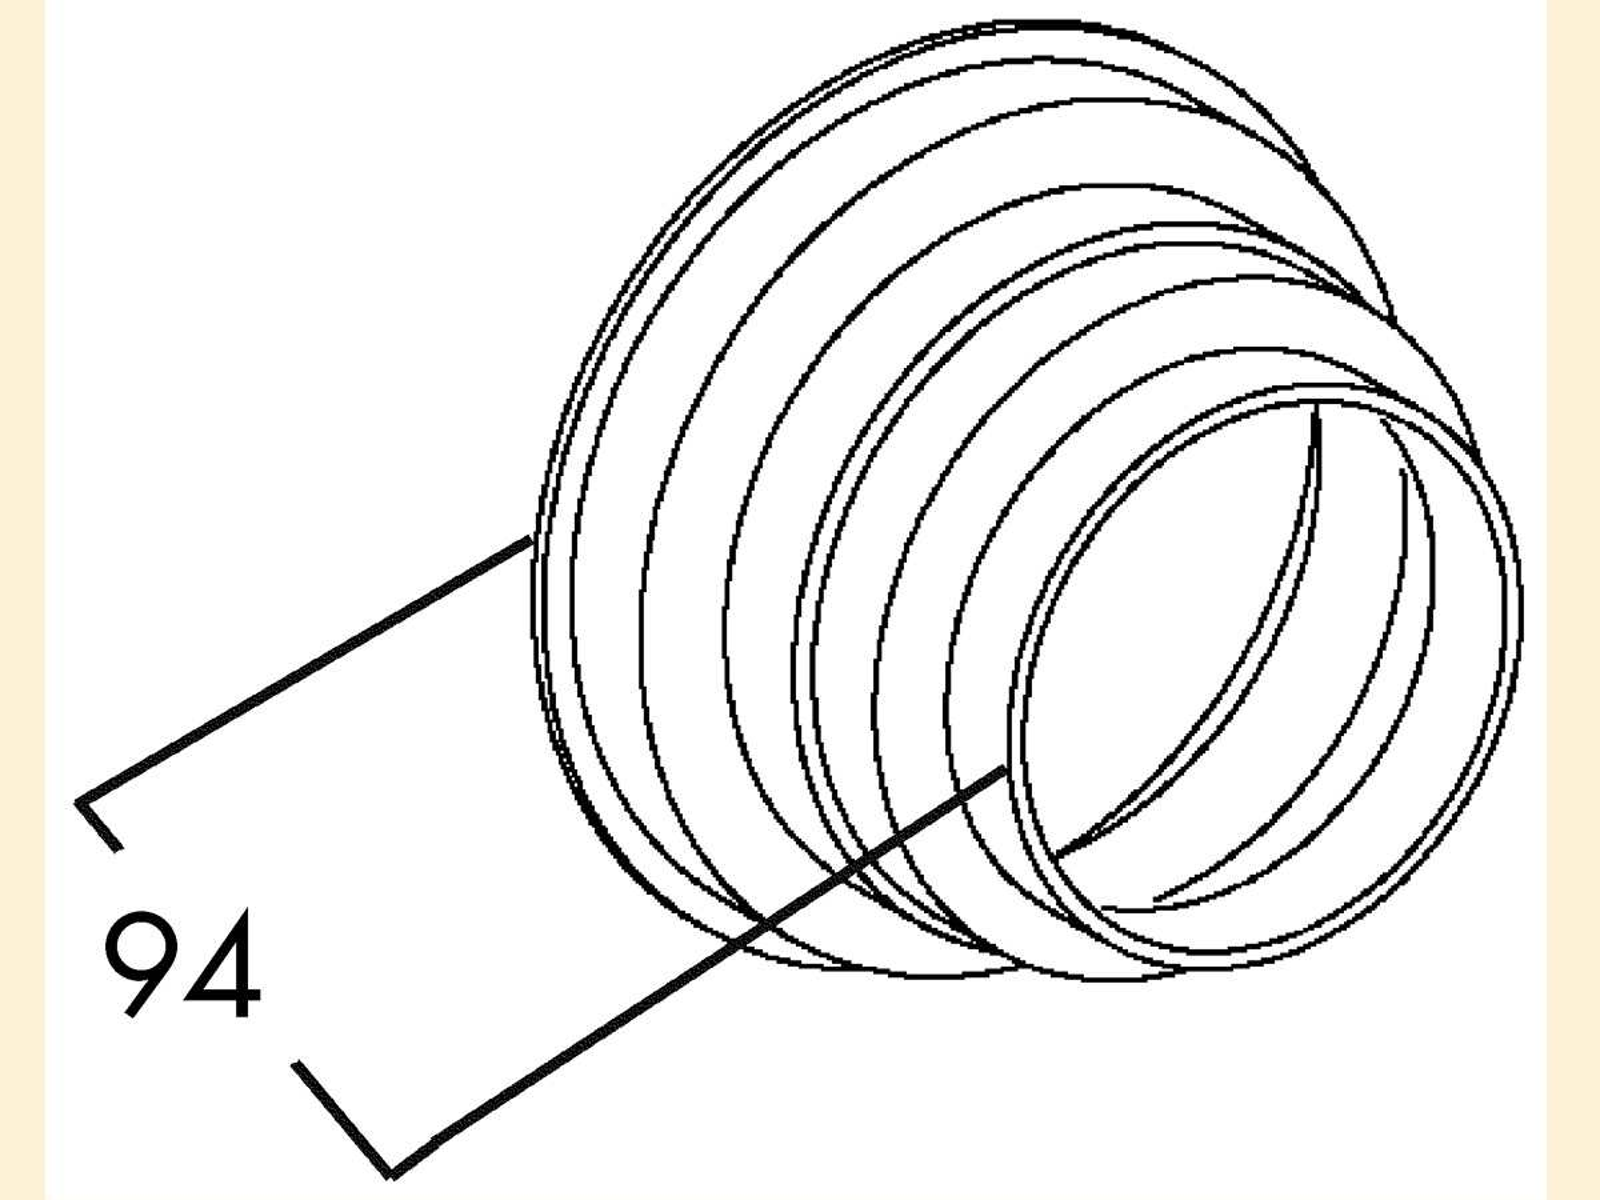 Compair 402.1.038 T-STU-ST Stufenring